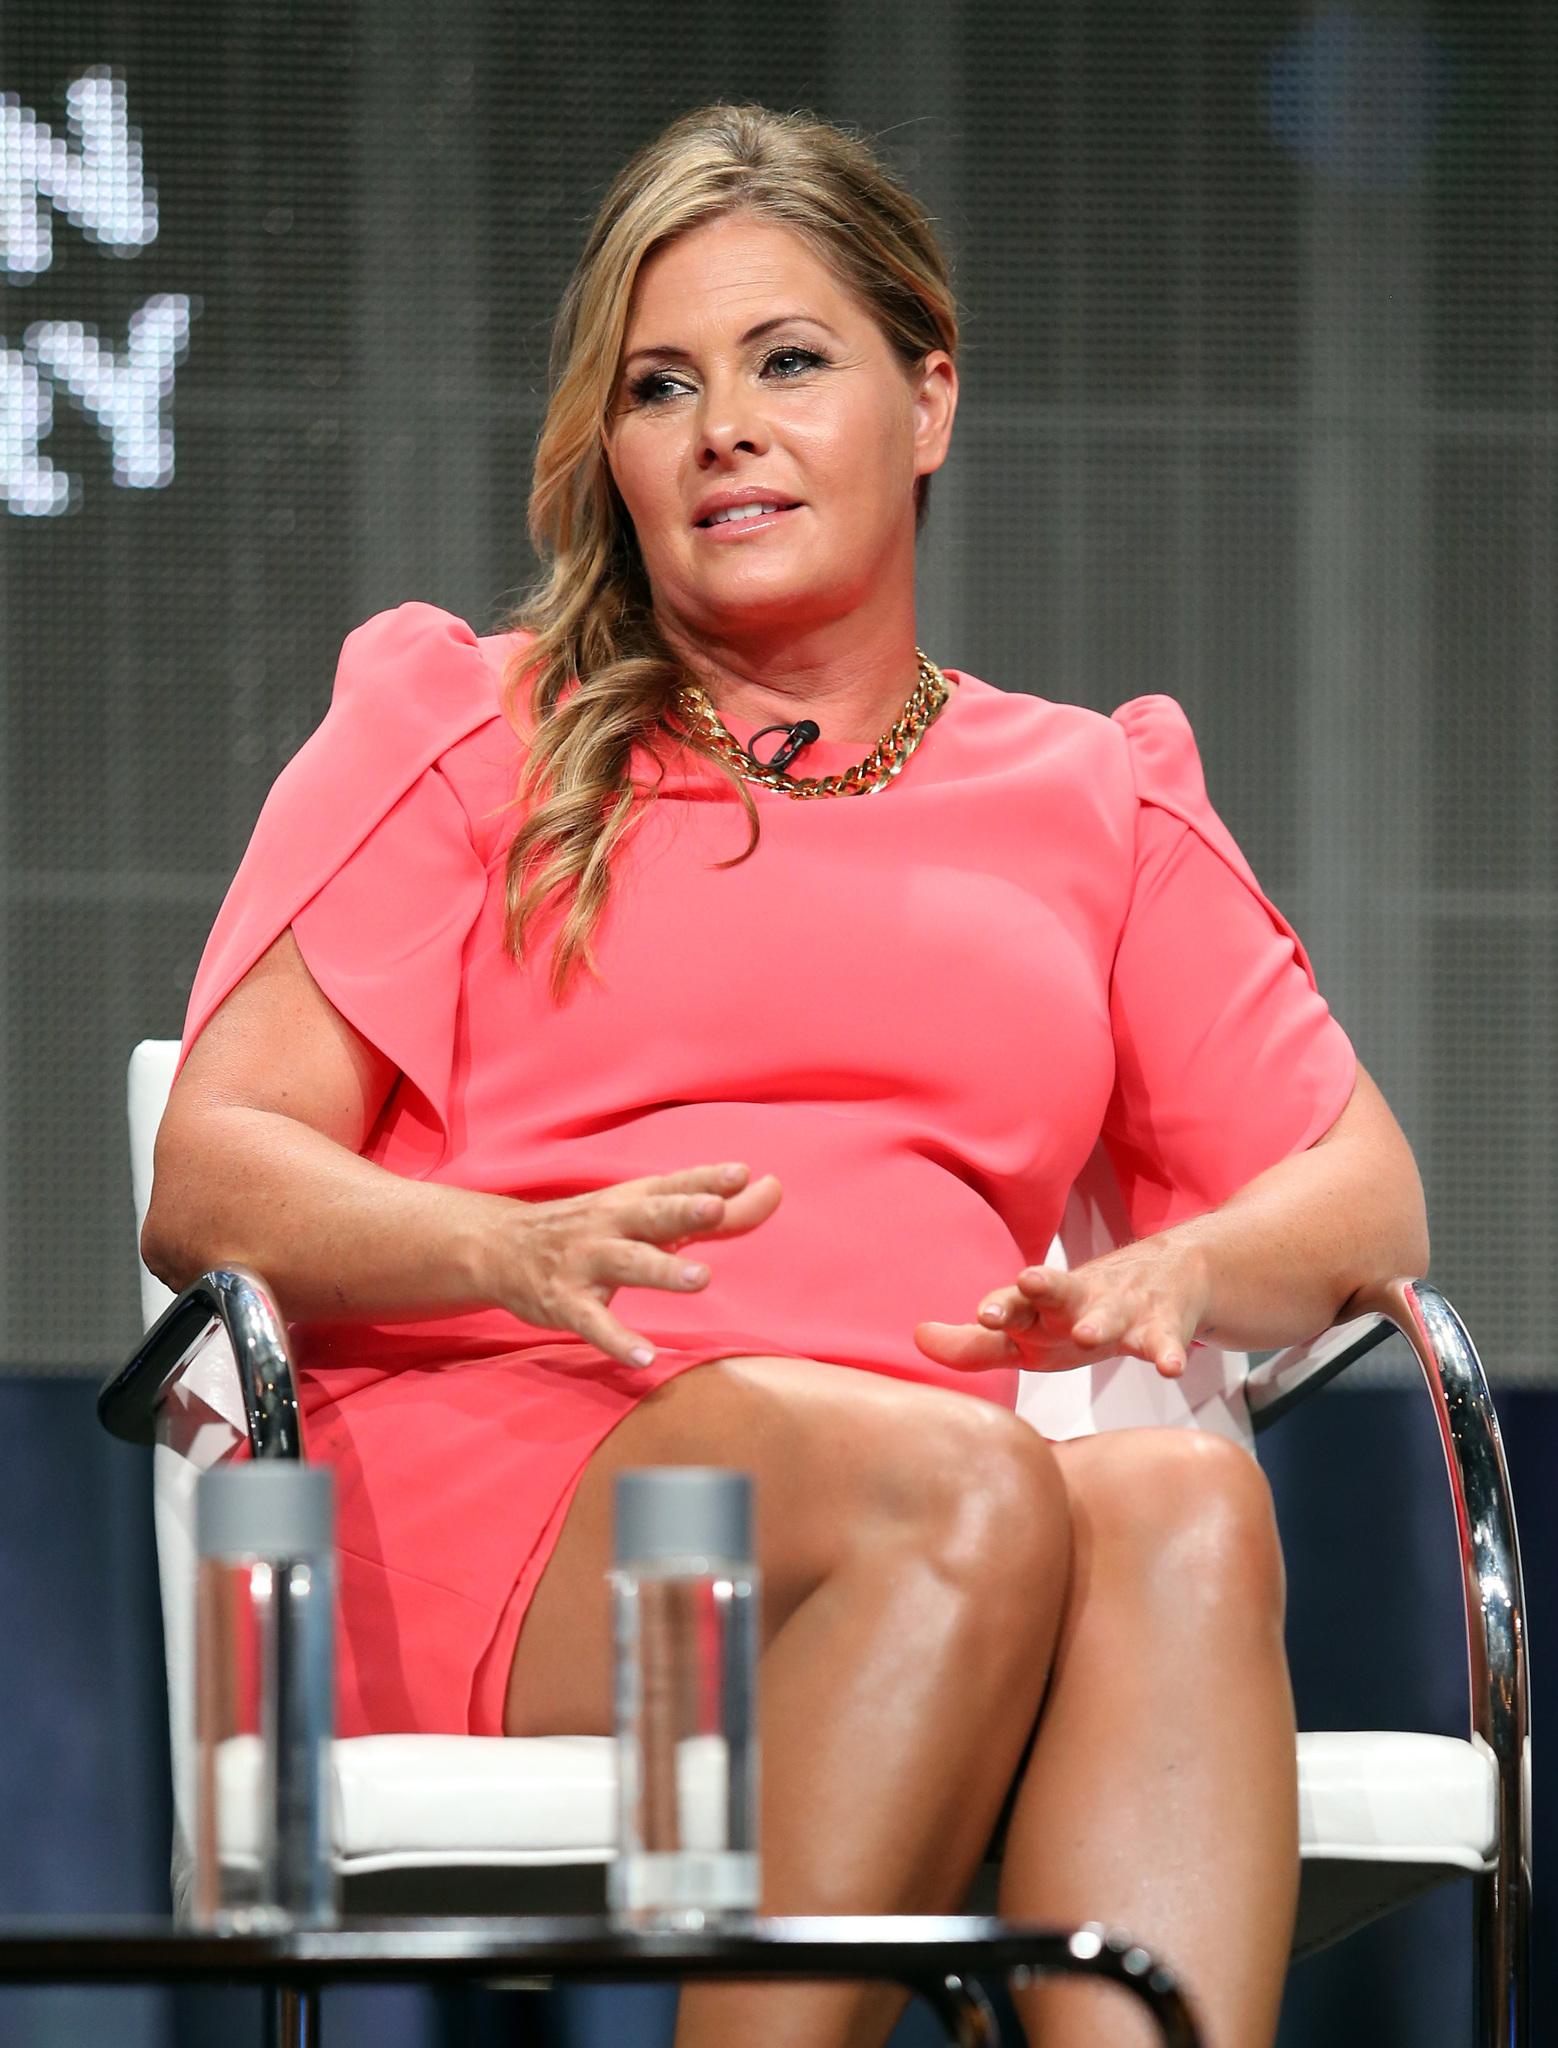 Nicole Eggert at event of Heartbreakers (2014)